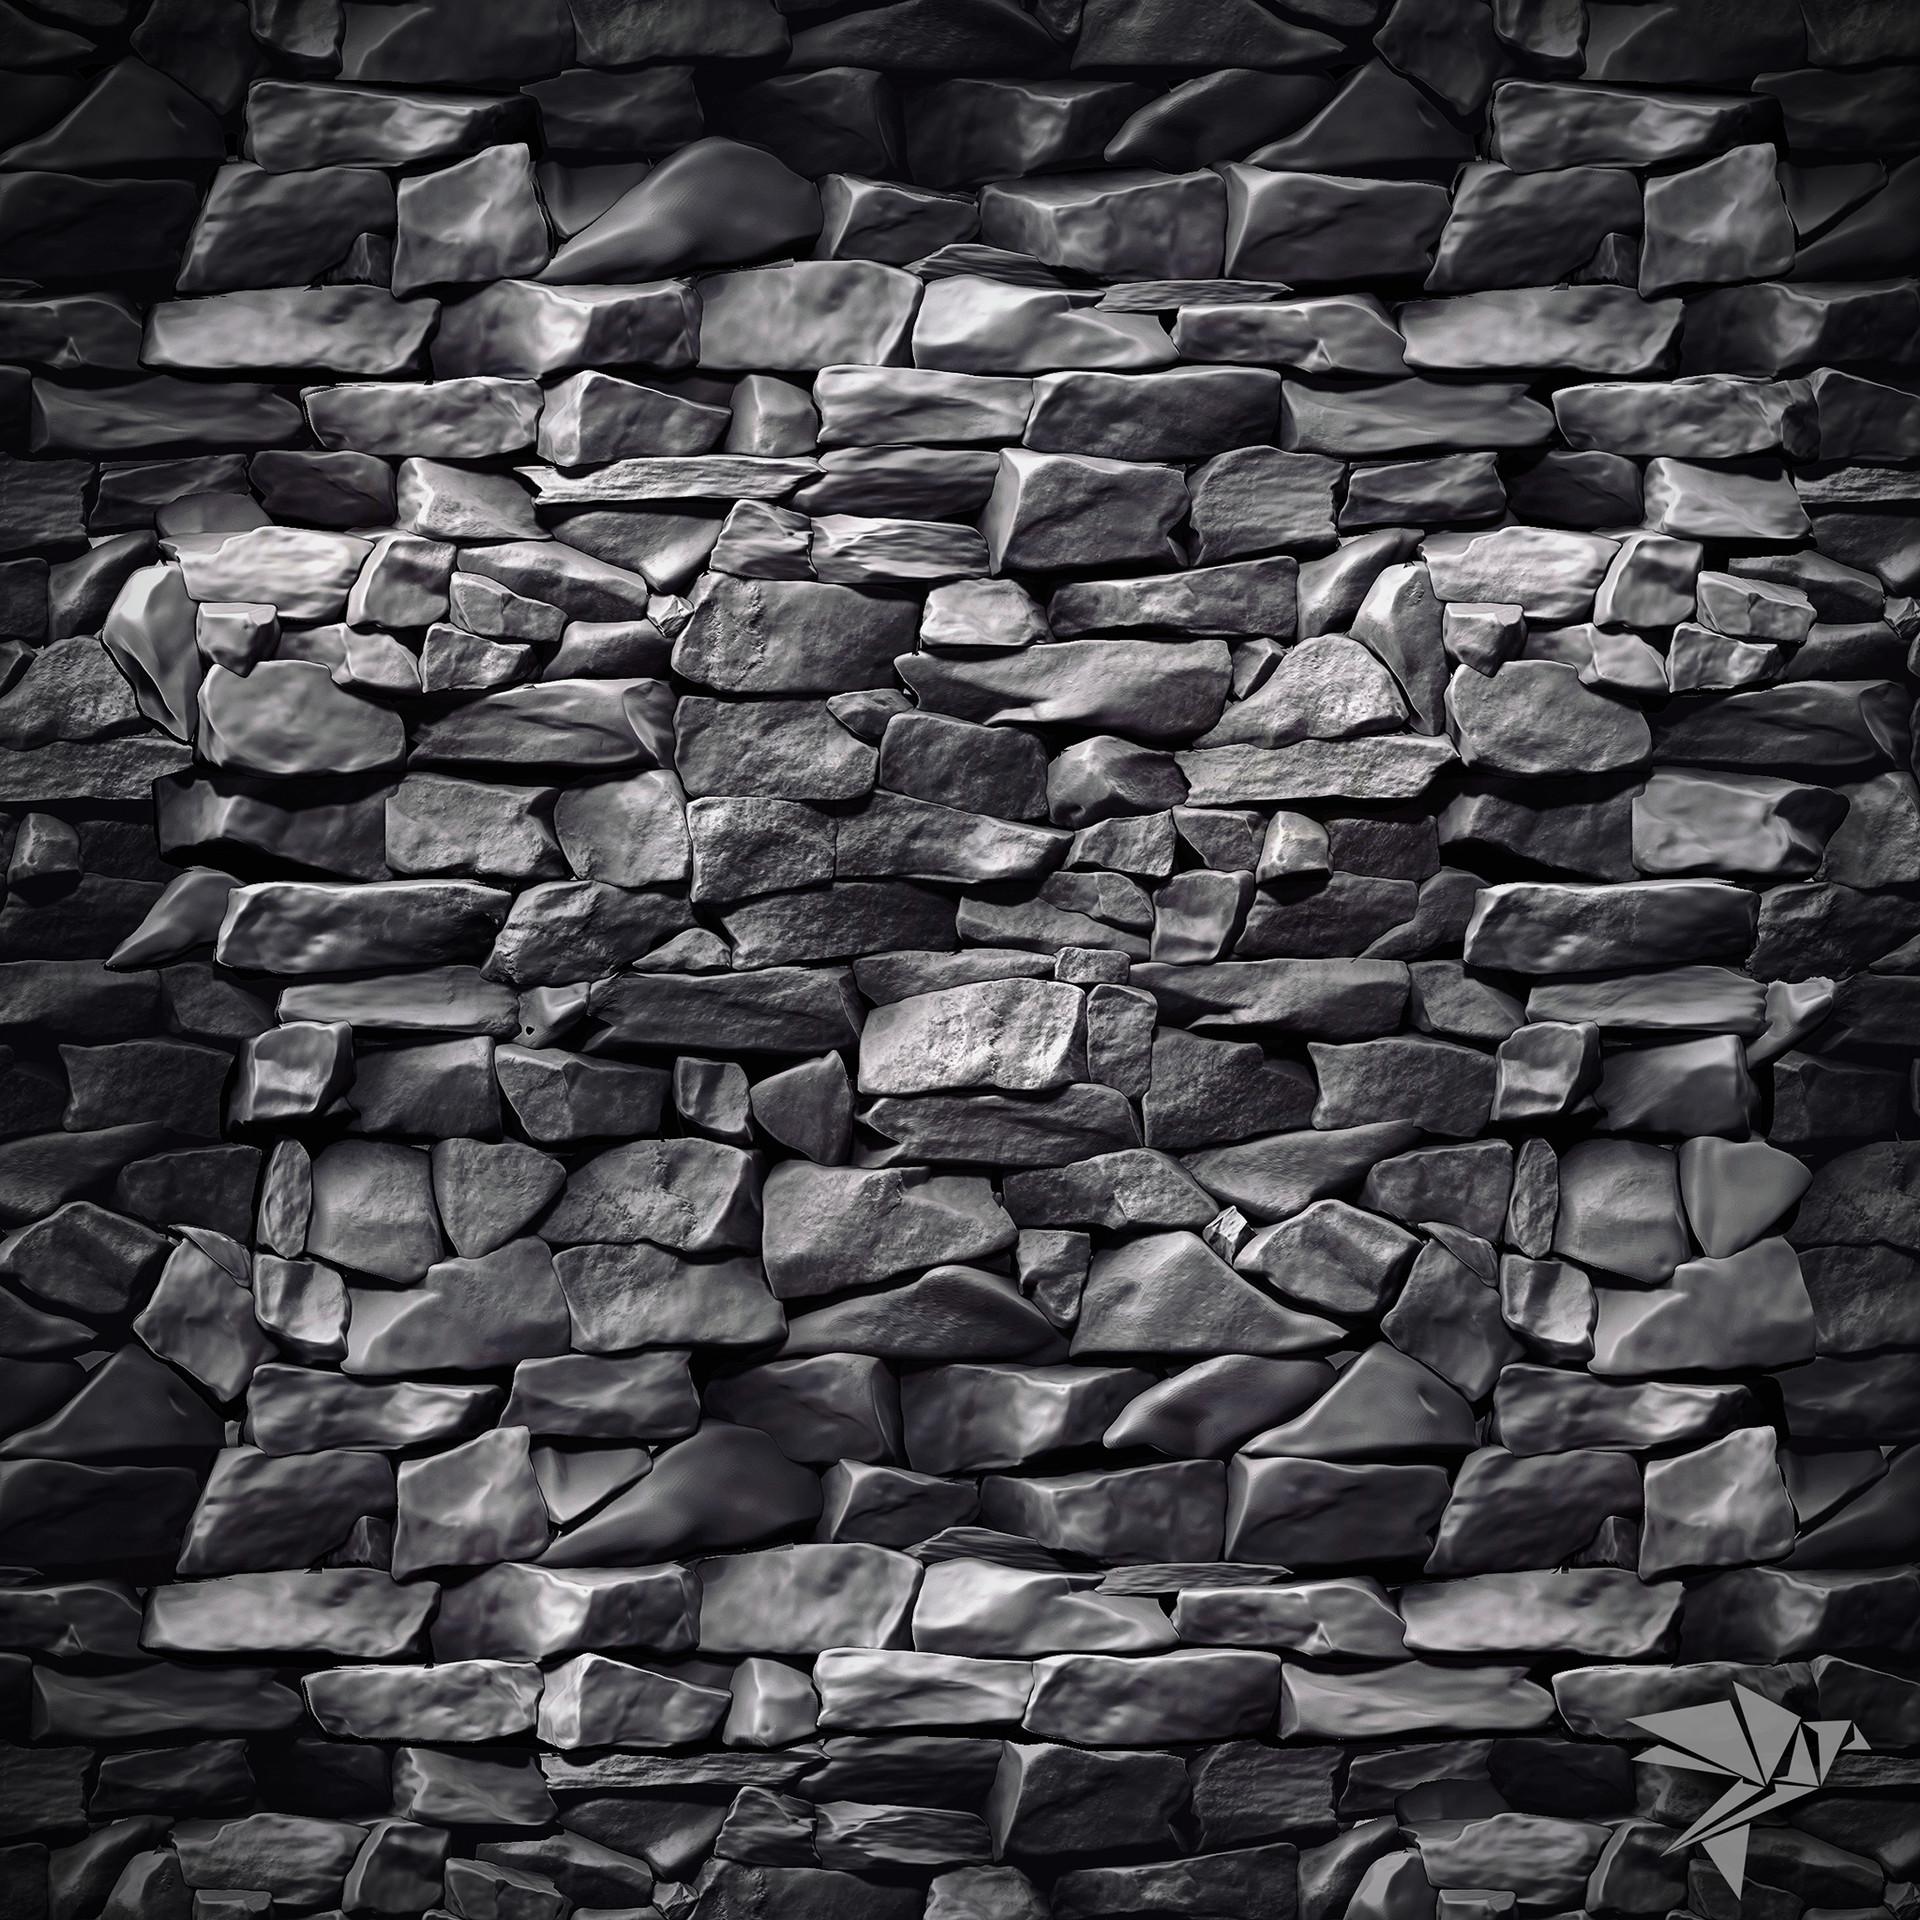 Mark ranson stonewall zbrushrender